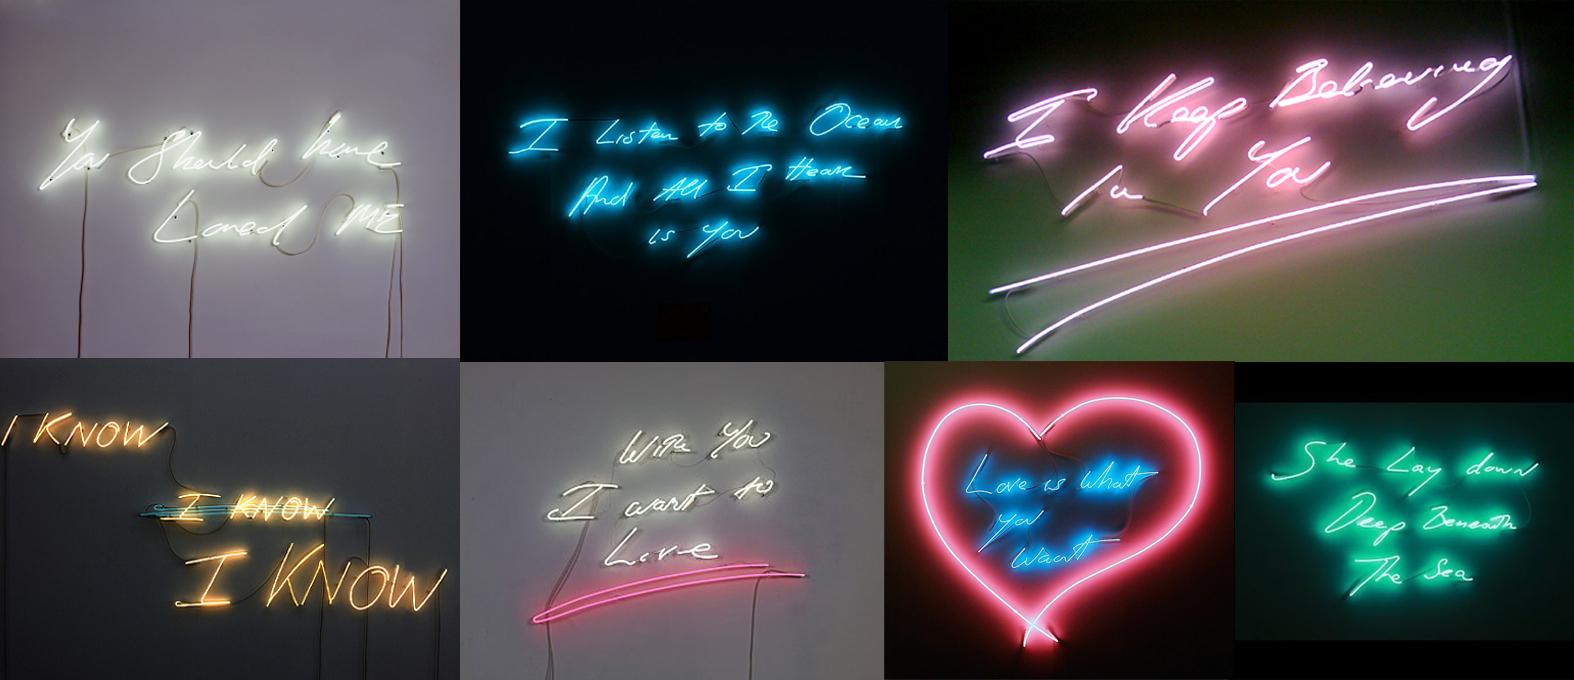 tracey emin�s neon confessions � creative inspiration